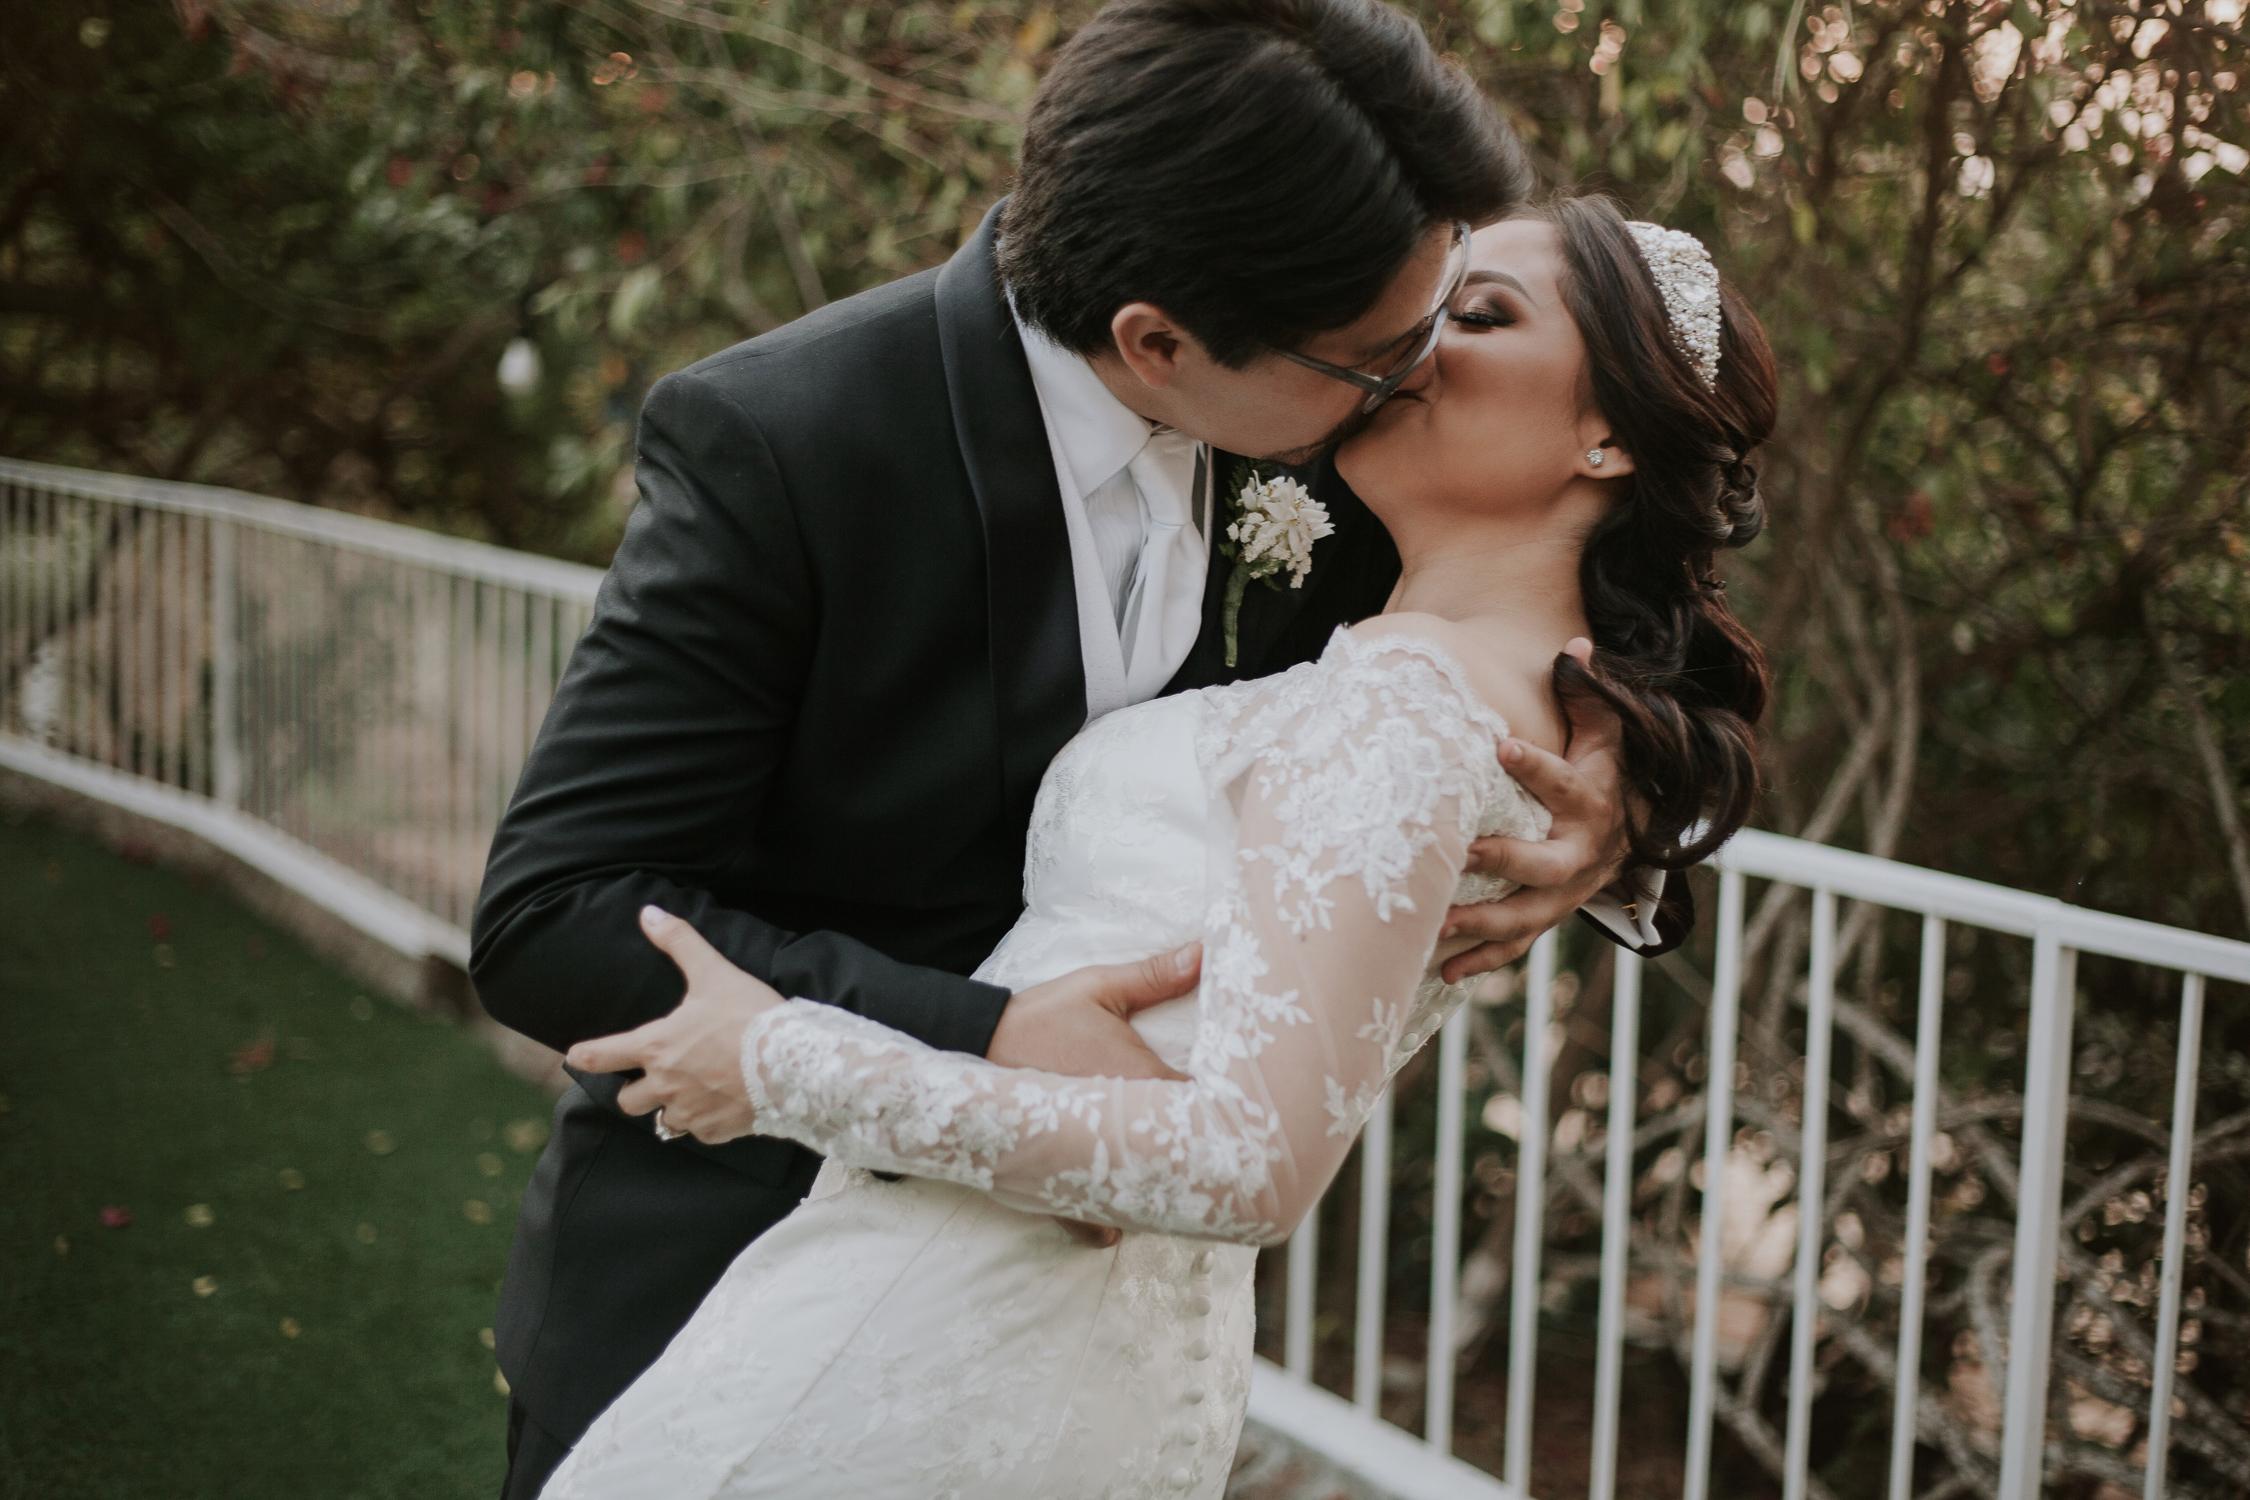 Michelle-Agurto-Fotografia-Bodas-Ecuador-Destination-Wedding-Photographer-Pauli-Edwin-20.JPG